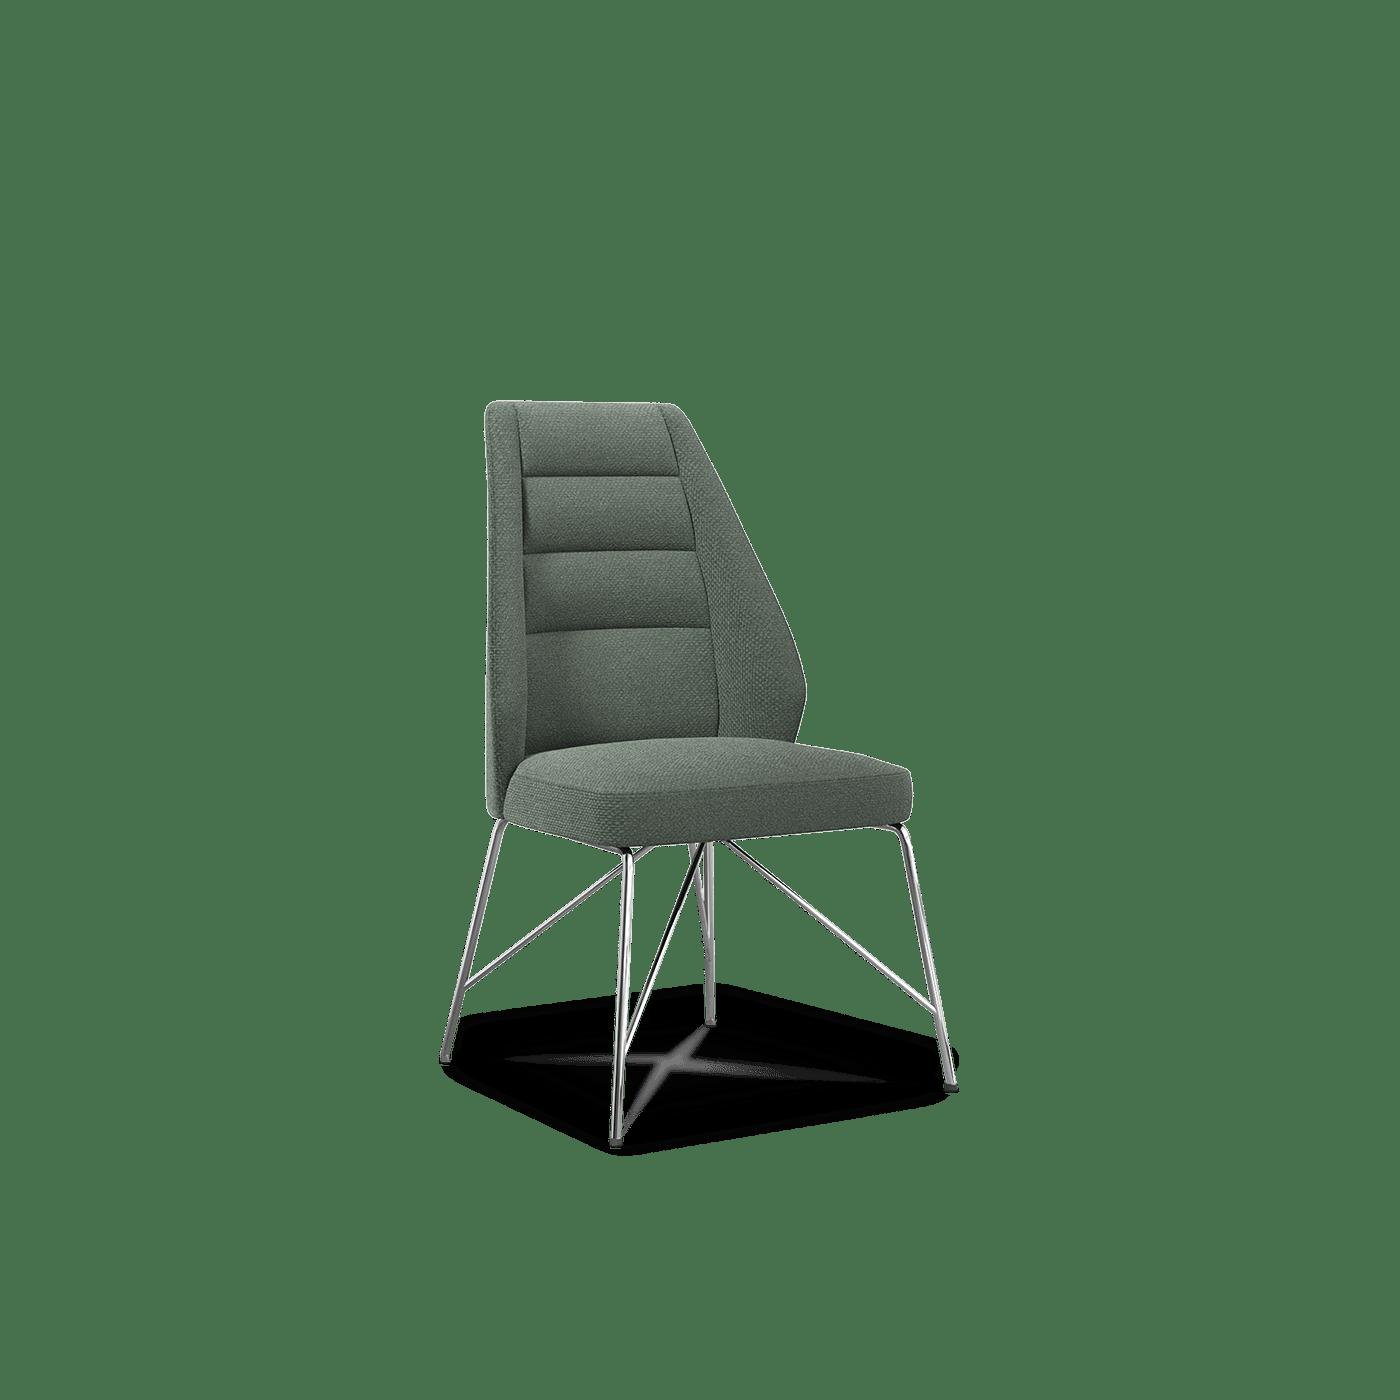 cadeira erly